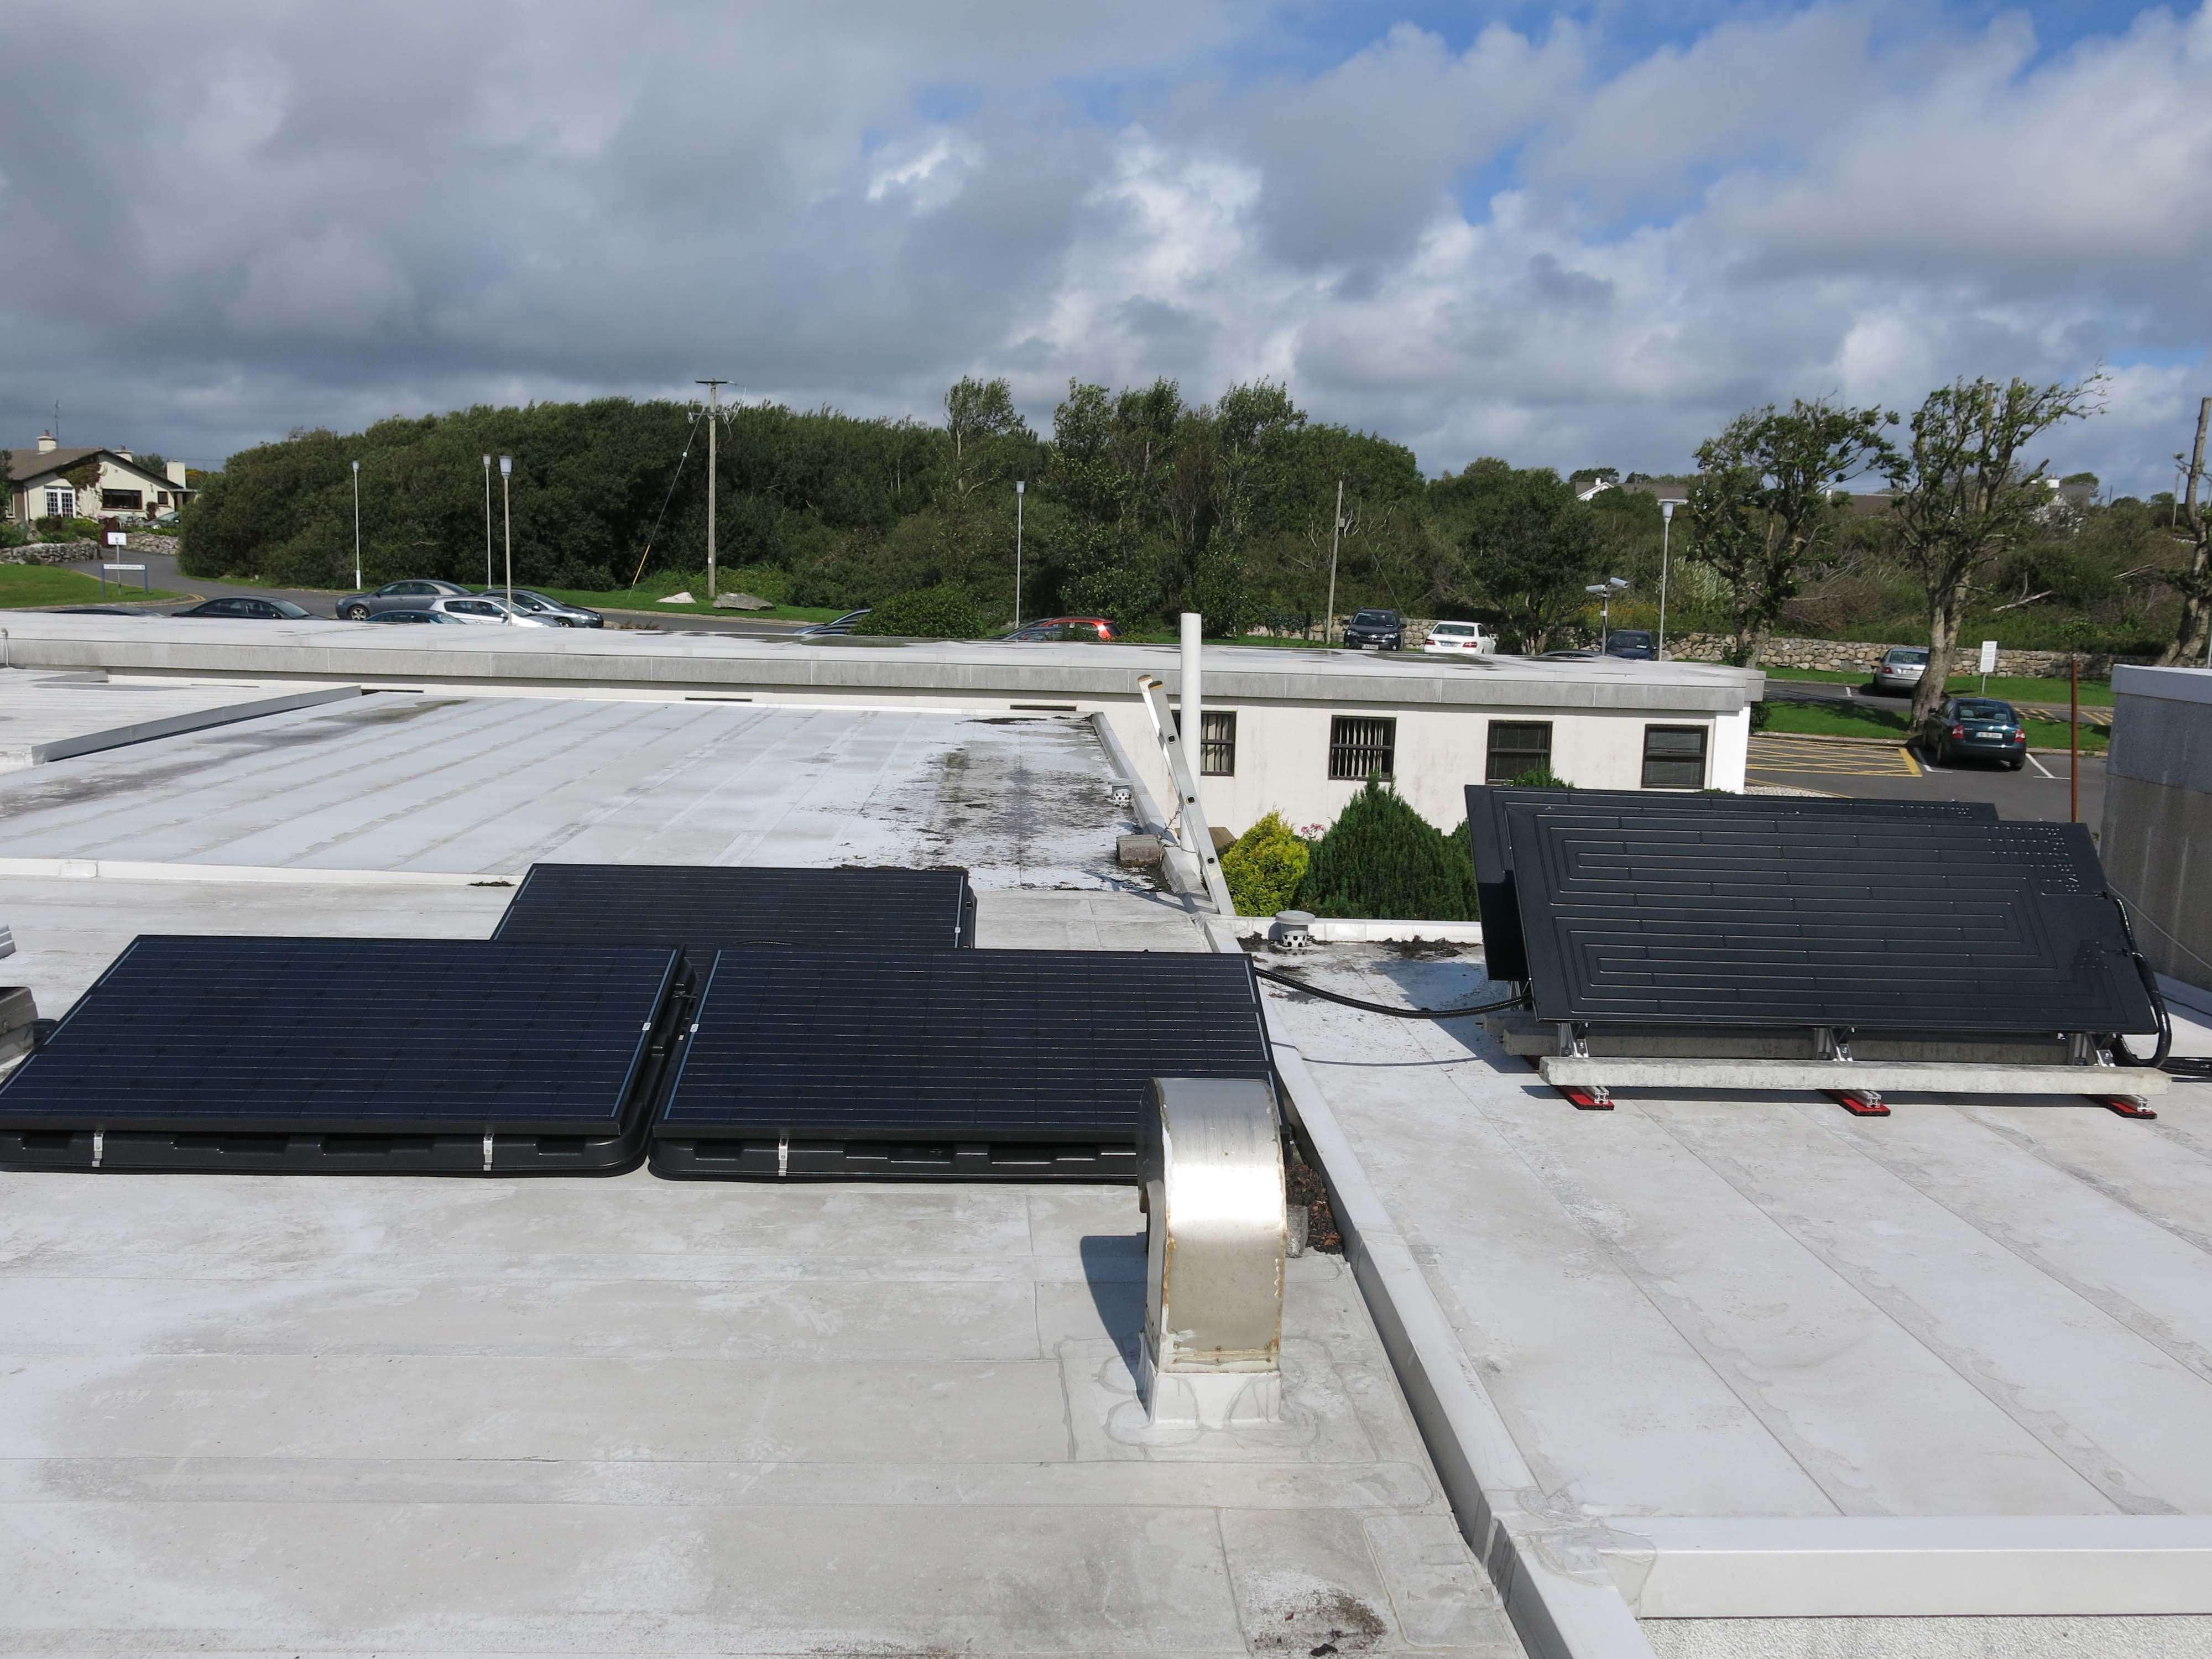 Thermodynamic Amp Pv Hybrids Lvp Renewables